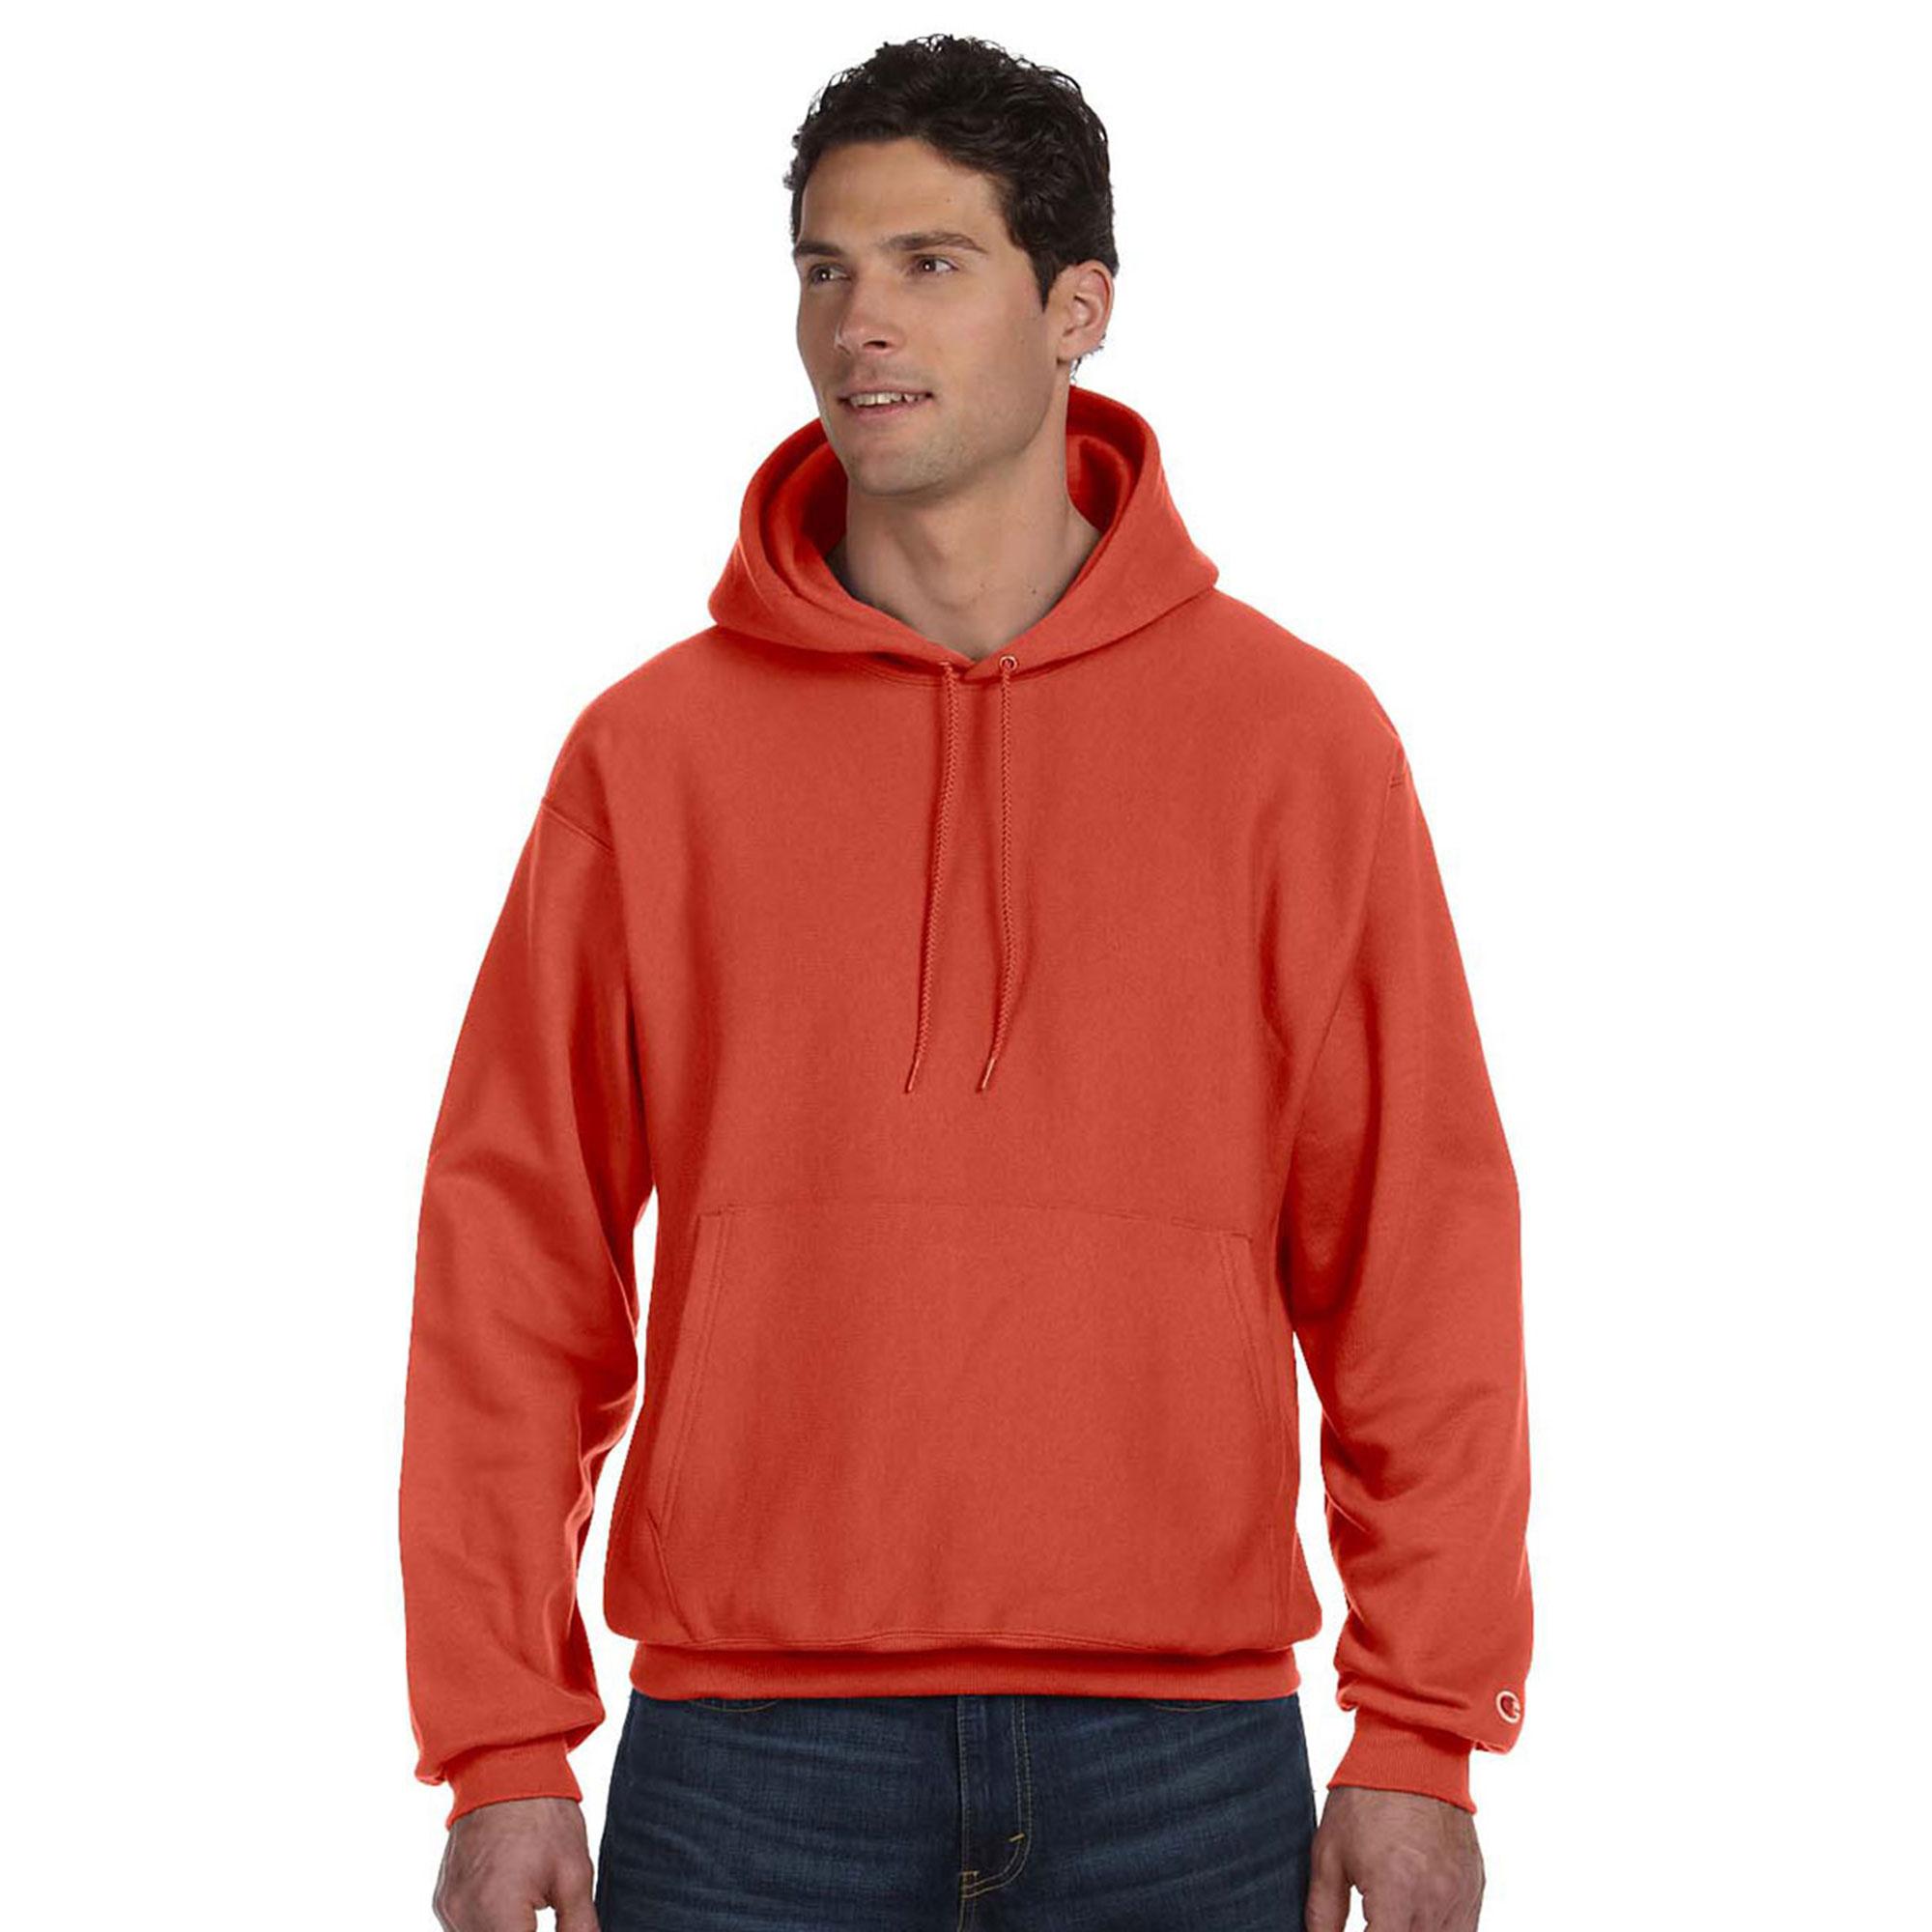 Champion Champion 12 oz 82/18 Reverse Weave Pullover Hoodie Sweatshirt S1051